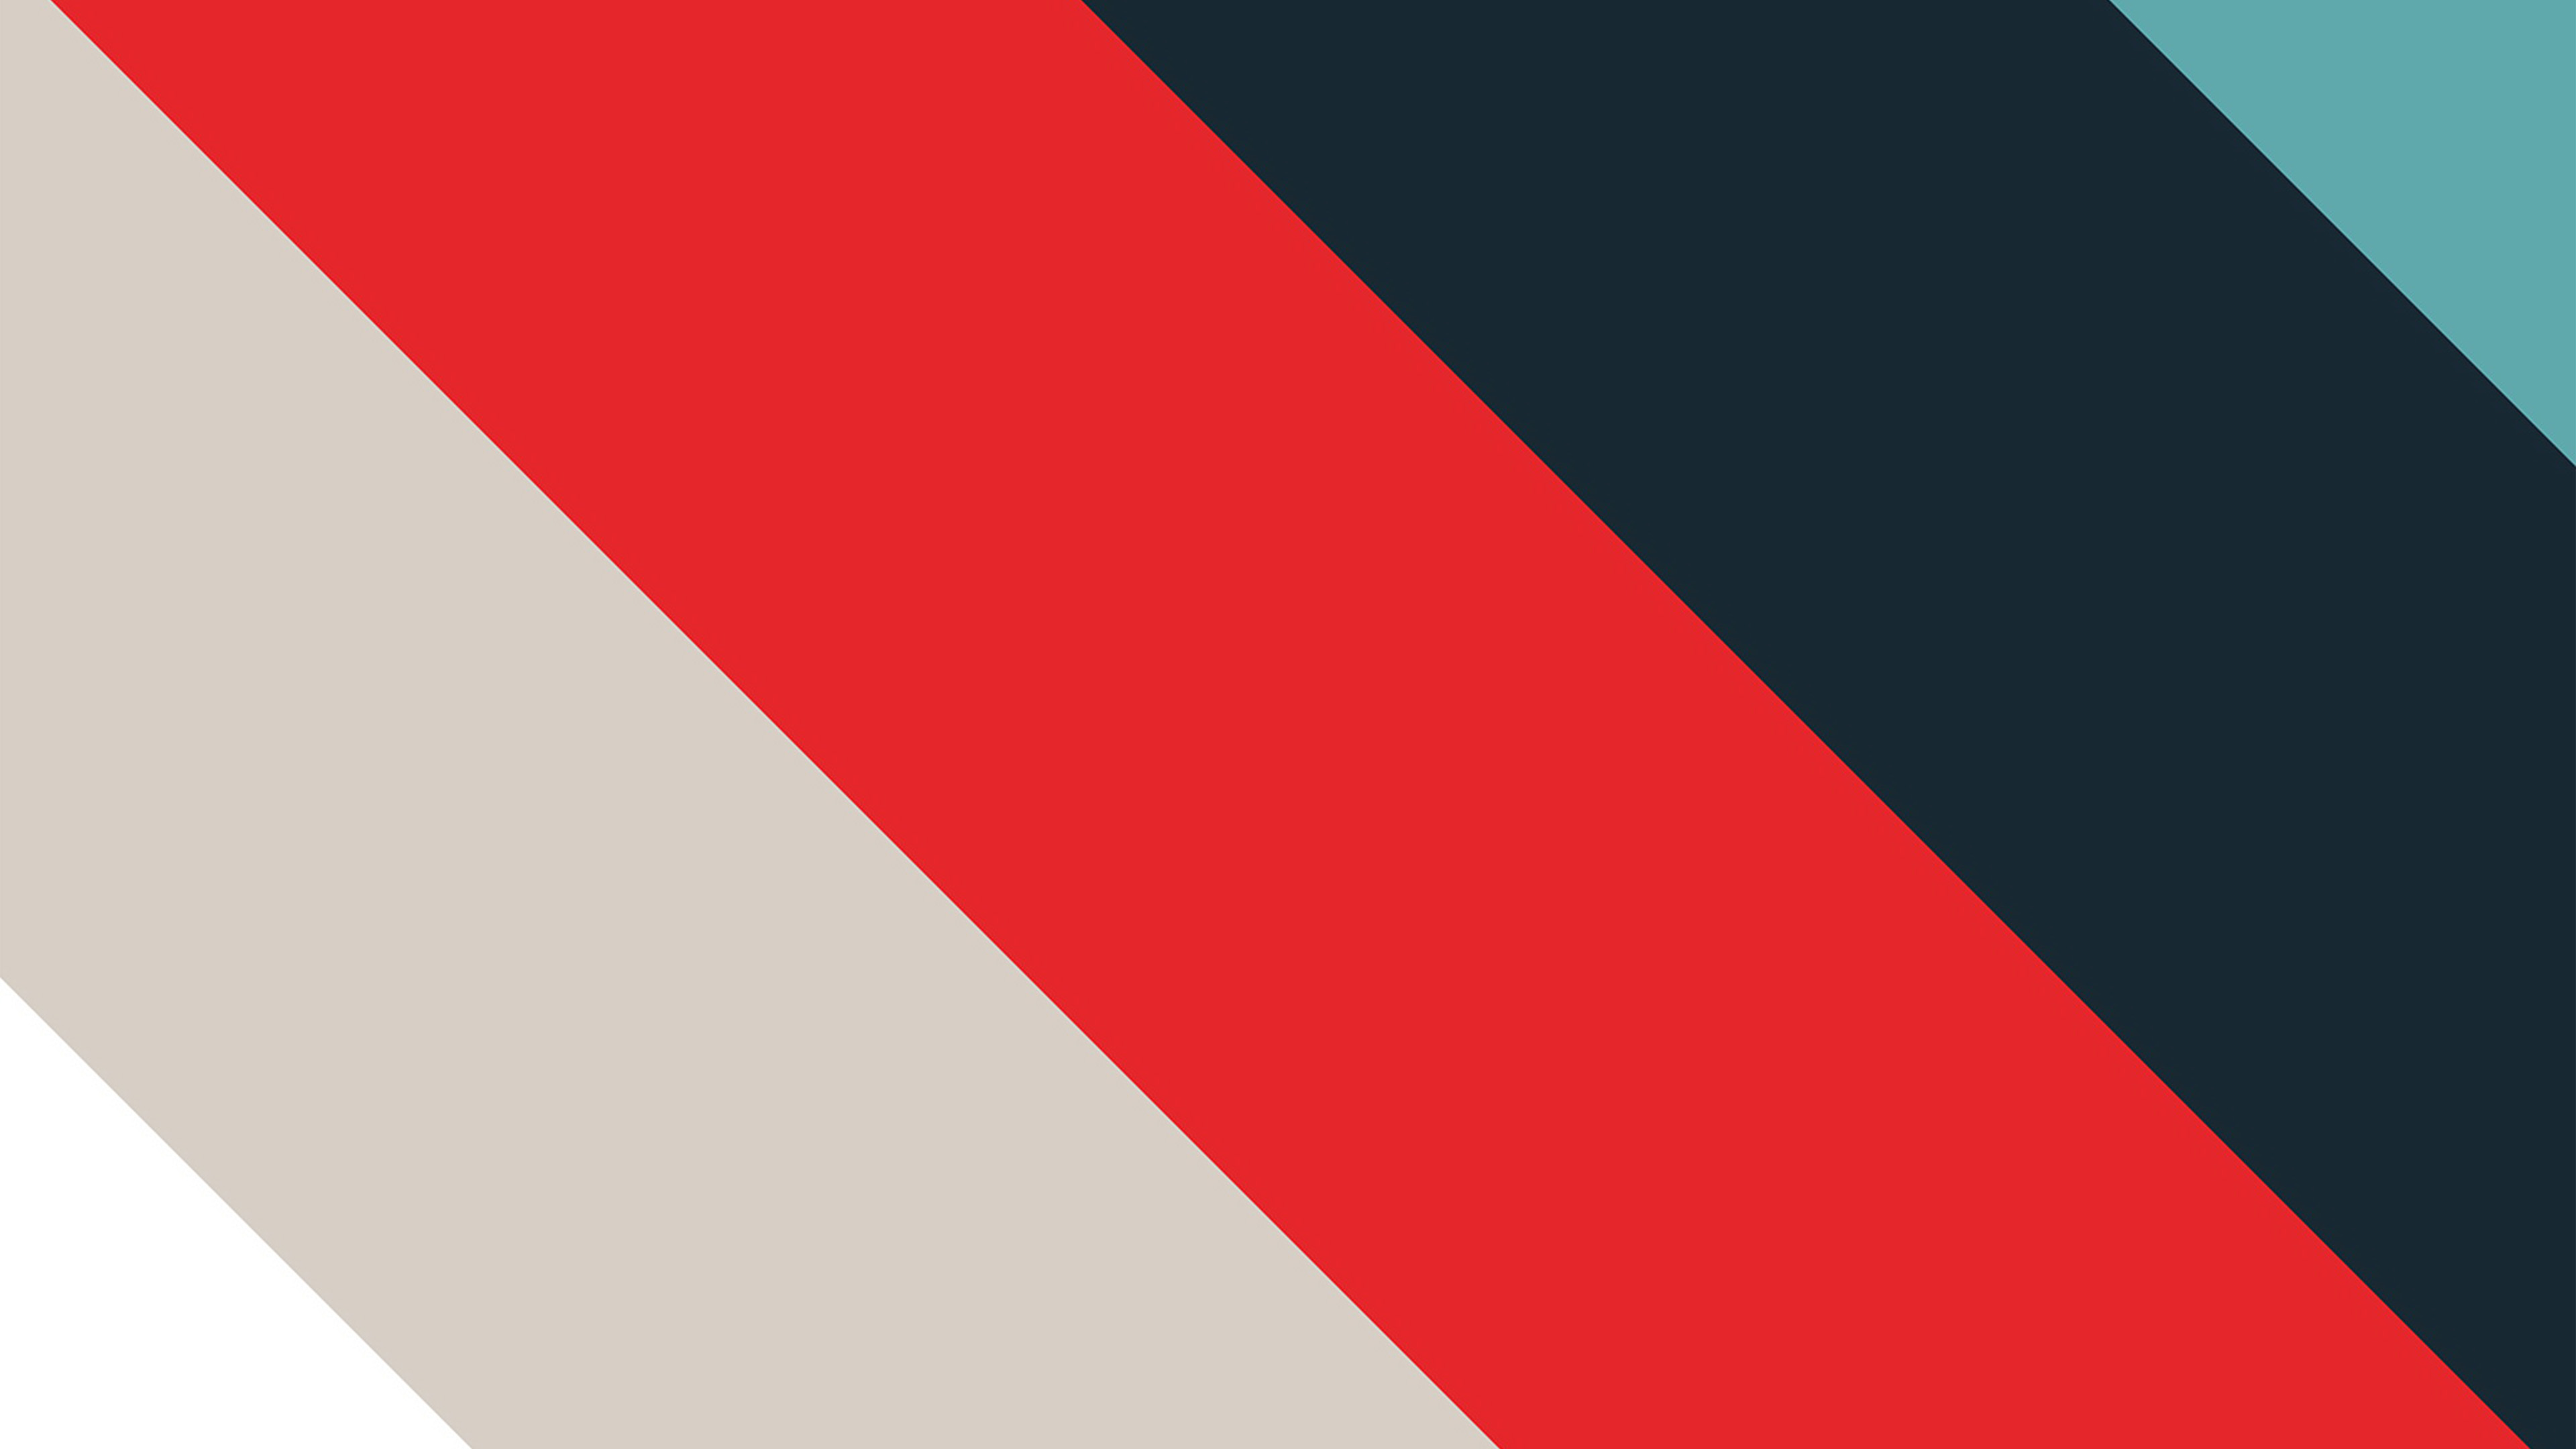 Macbook Wallpaper Fall Vs39 Blue Red Stripe Minimal Pattern Wallpaper